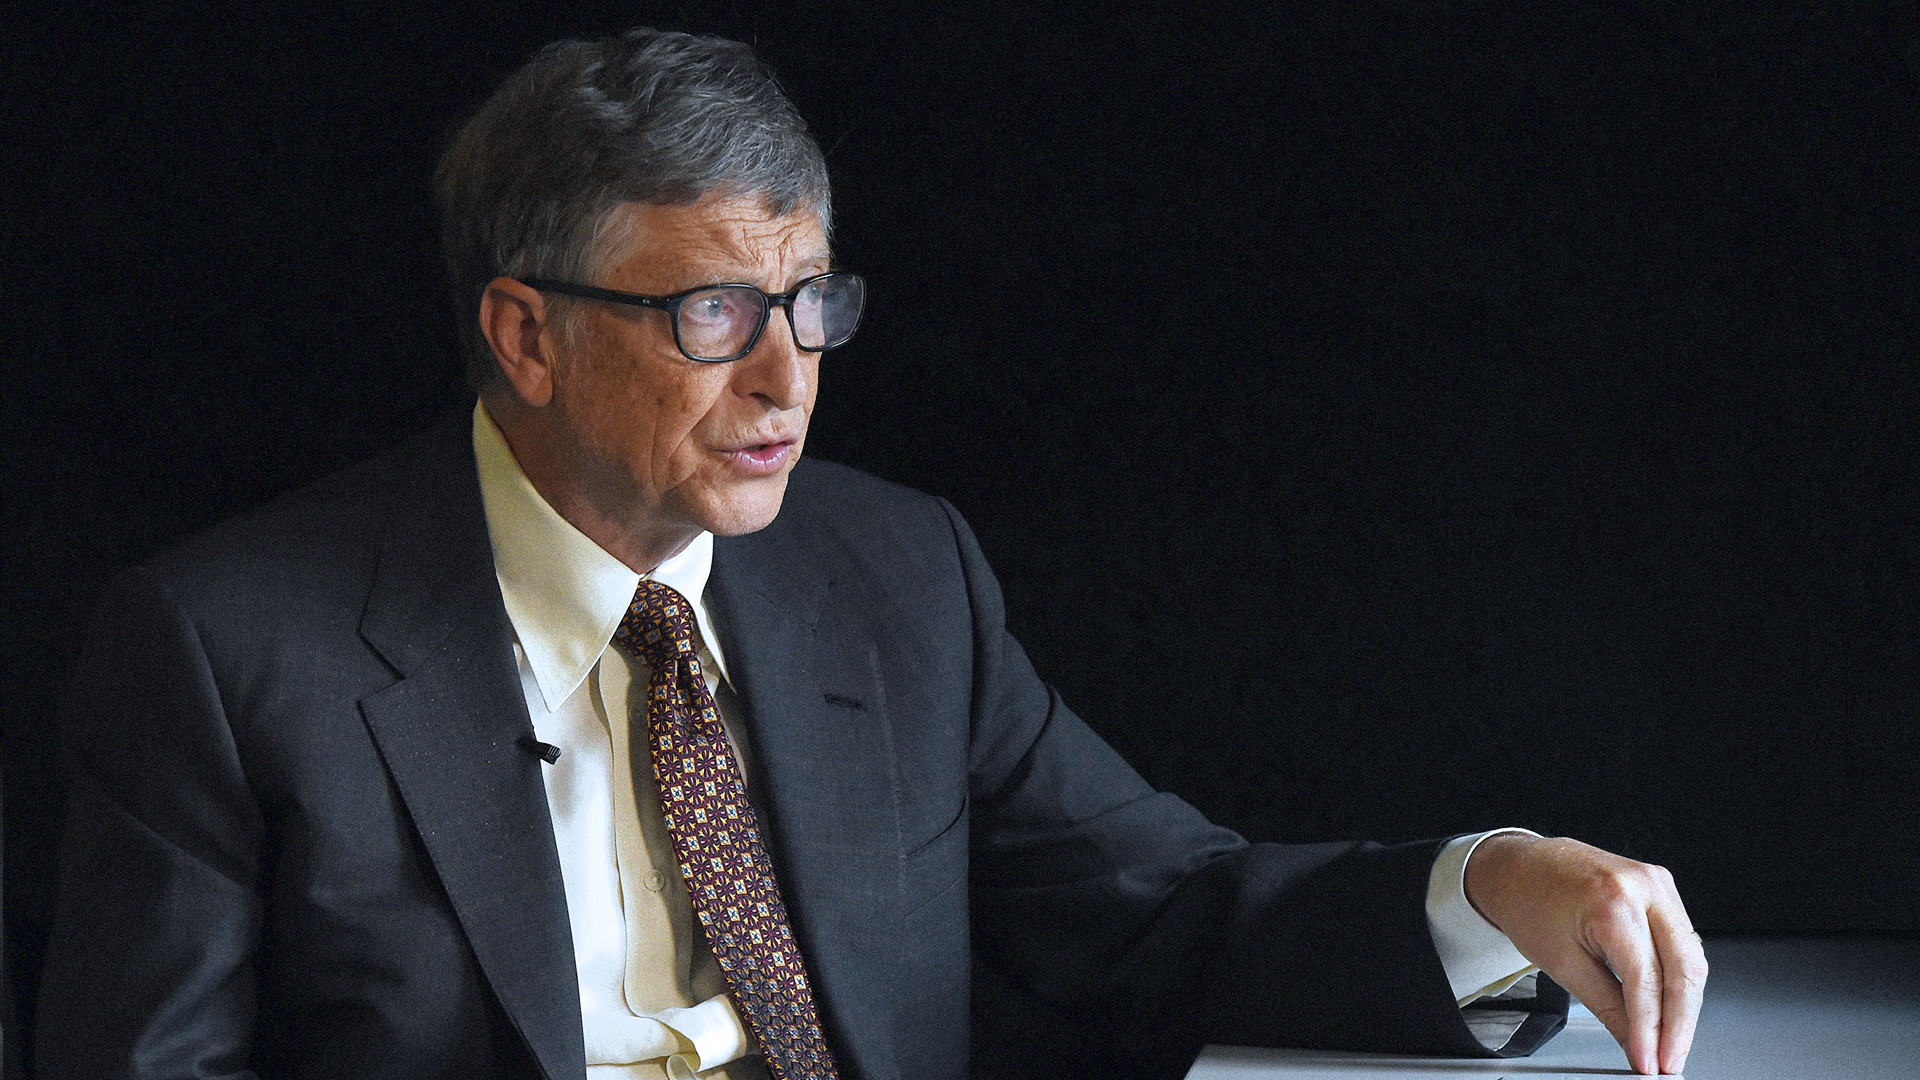 Quotes Hindi Wallpaper Download Bill Gates Wallpaper 73 Images